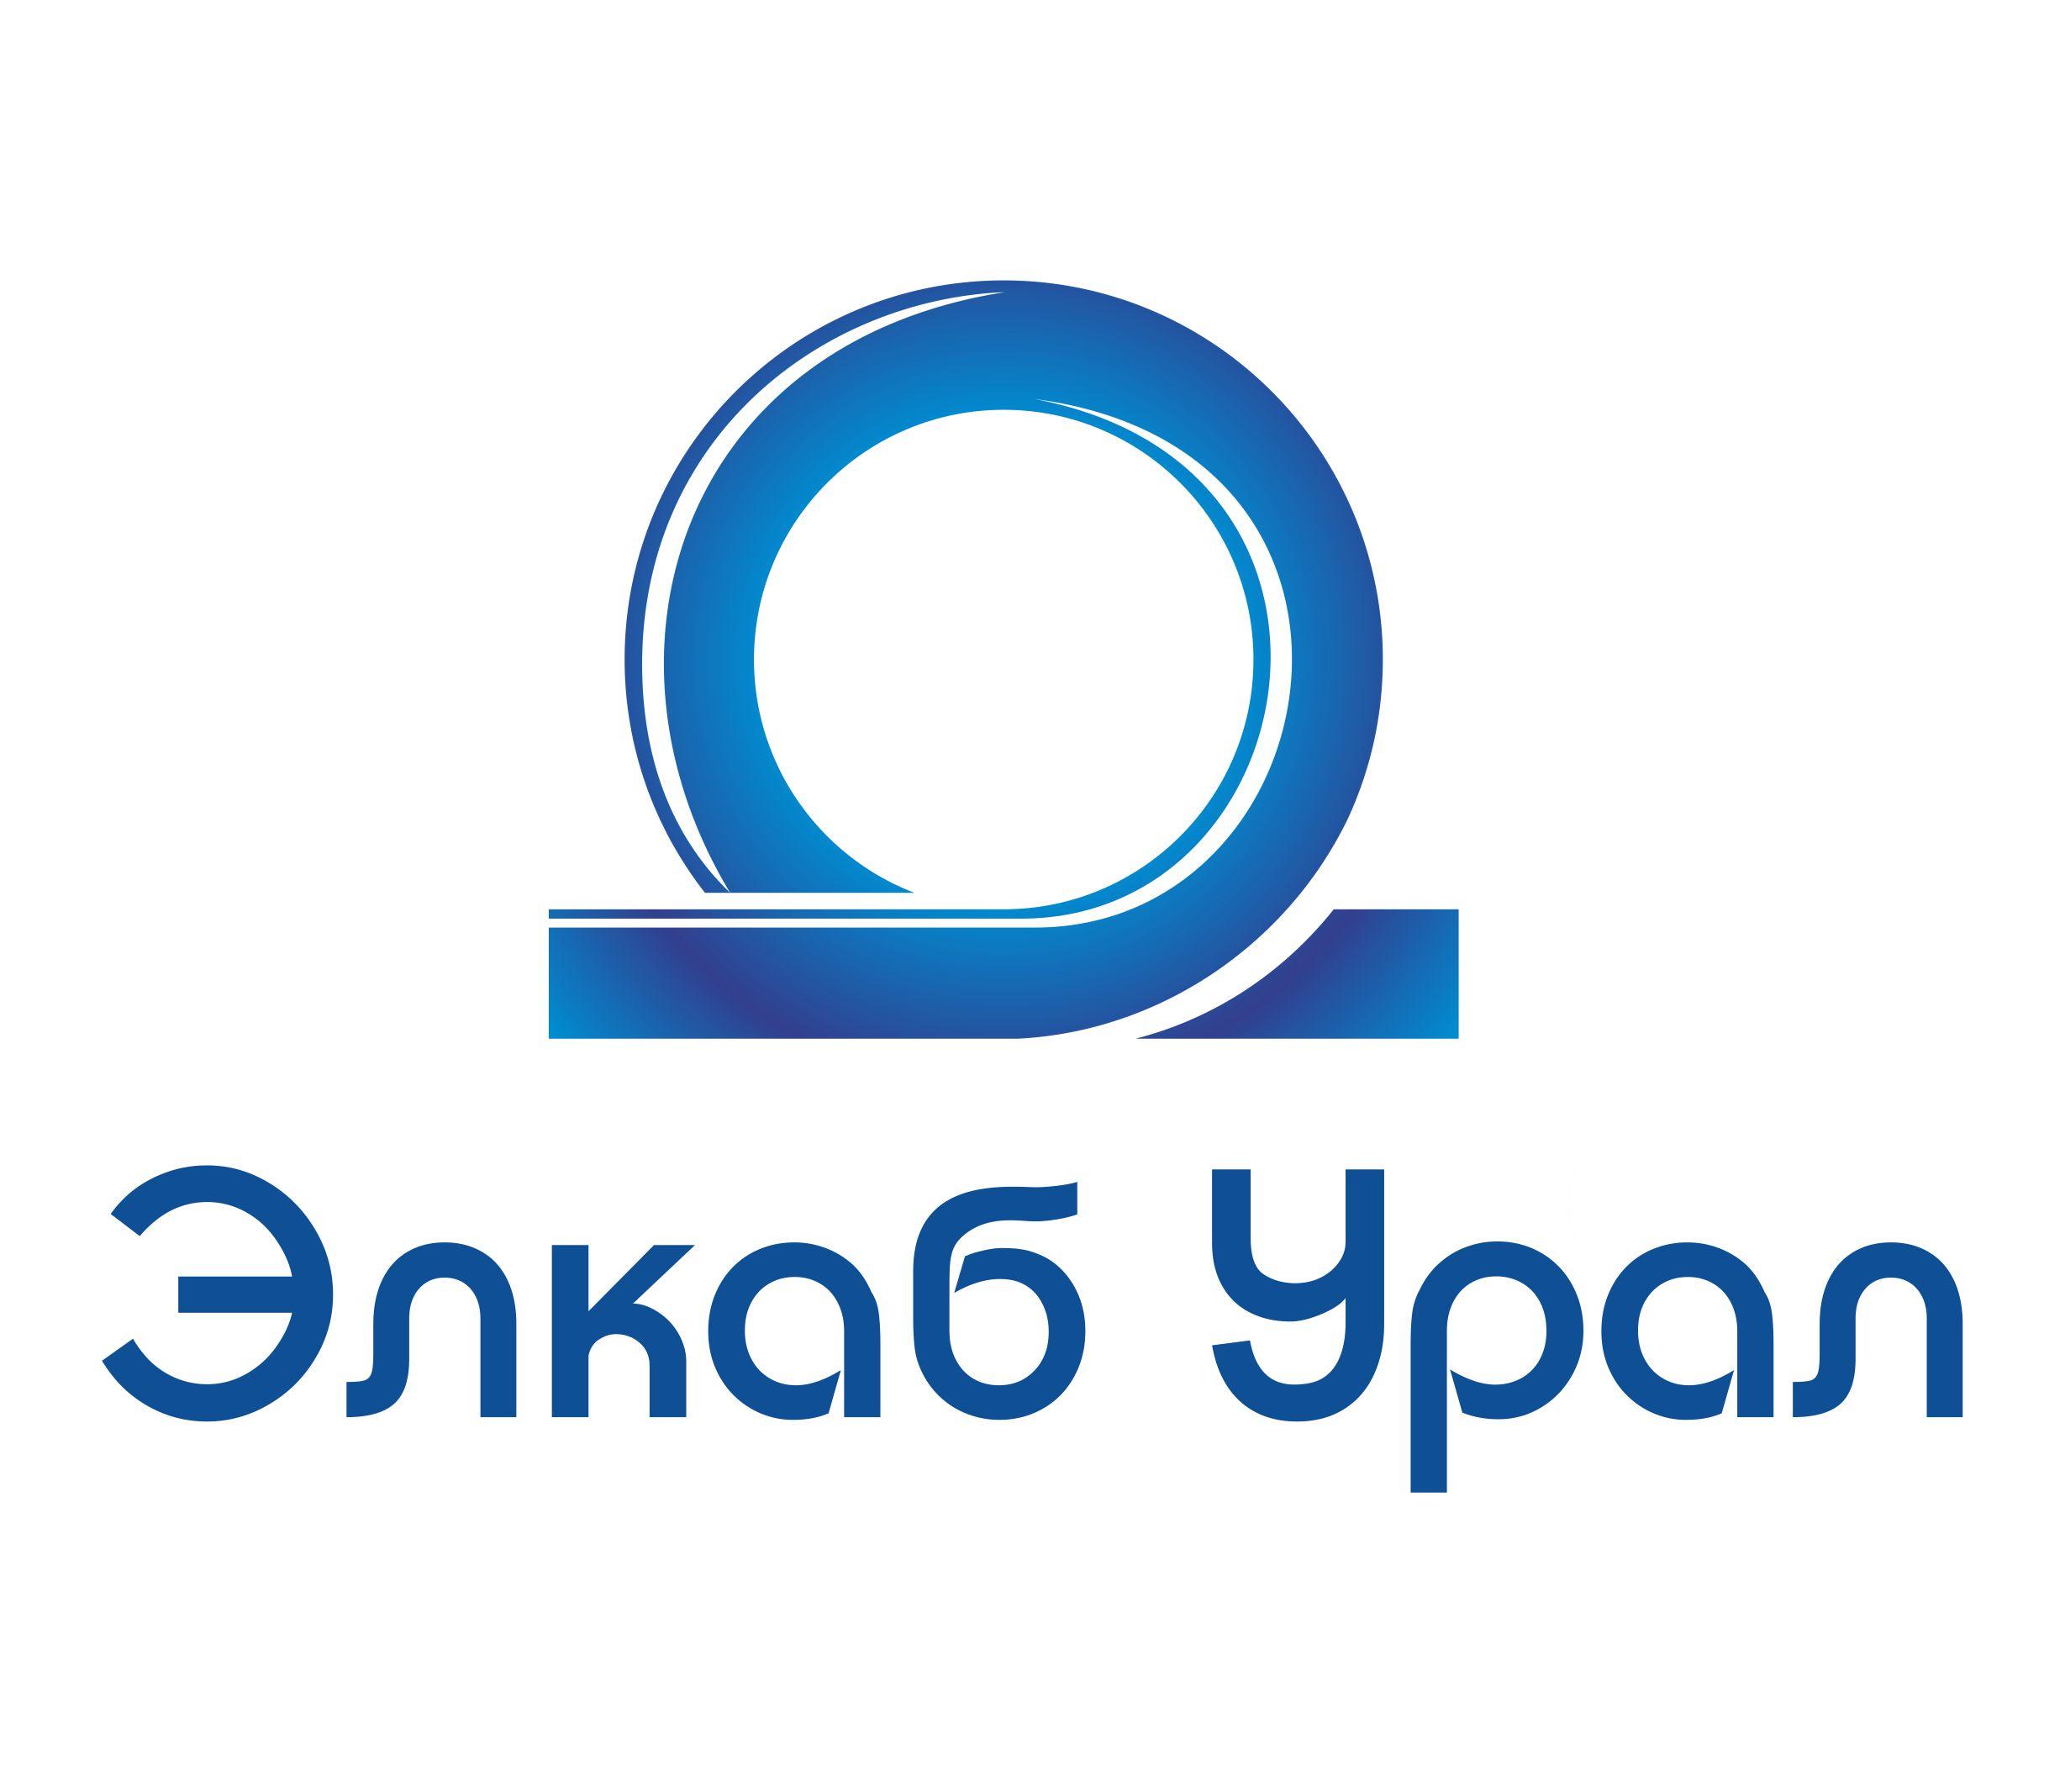 Элкаб-Урал, ООО